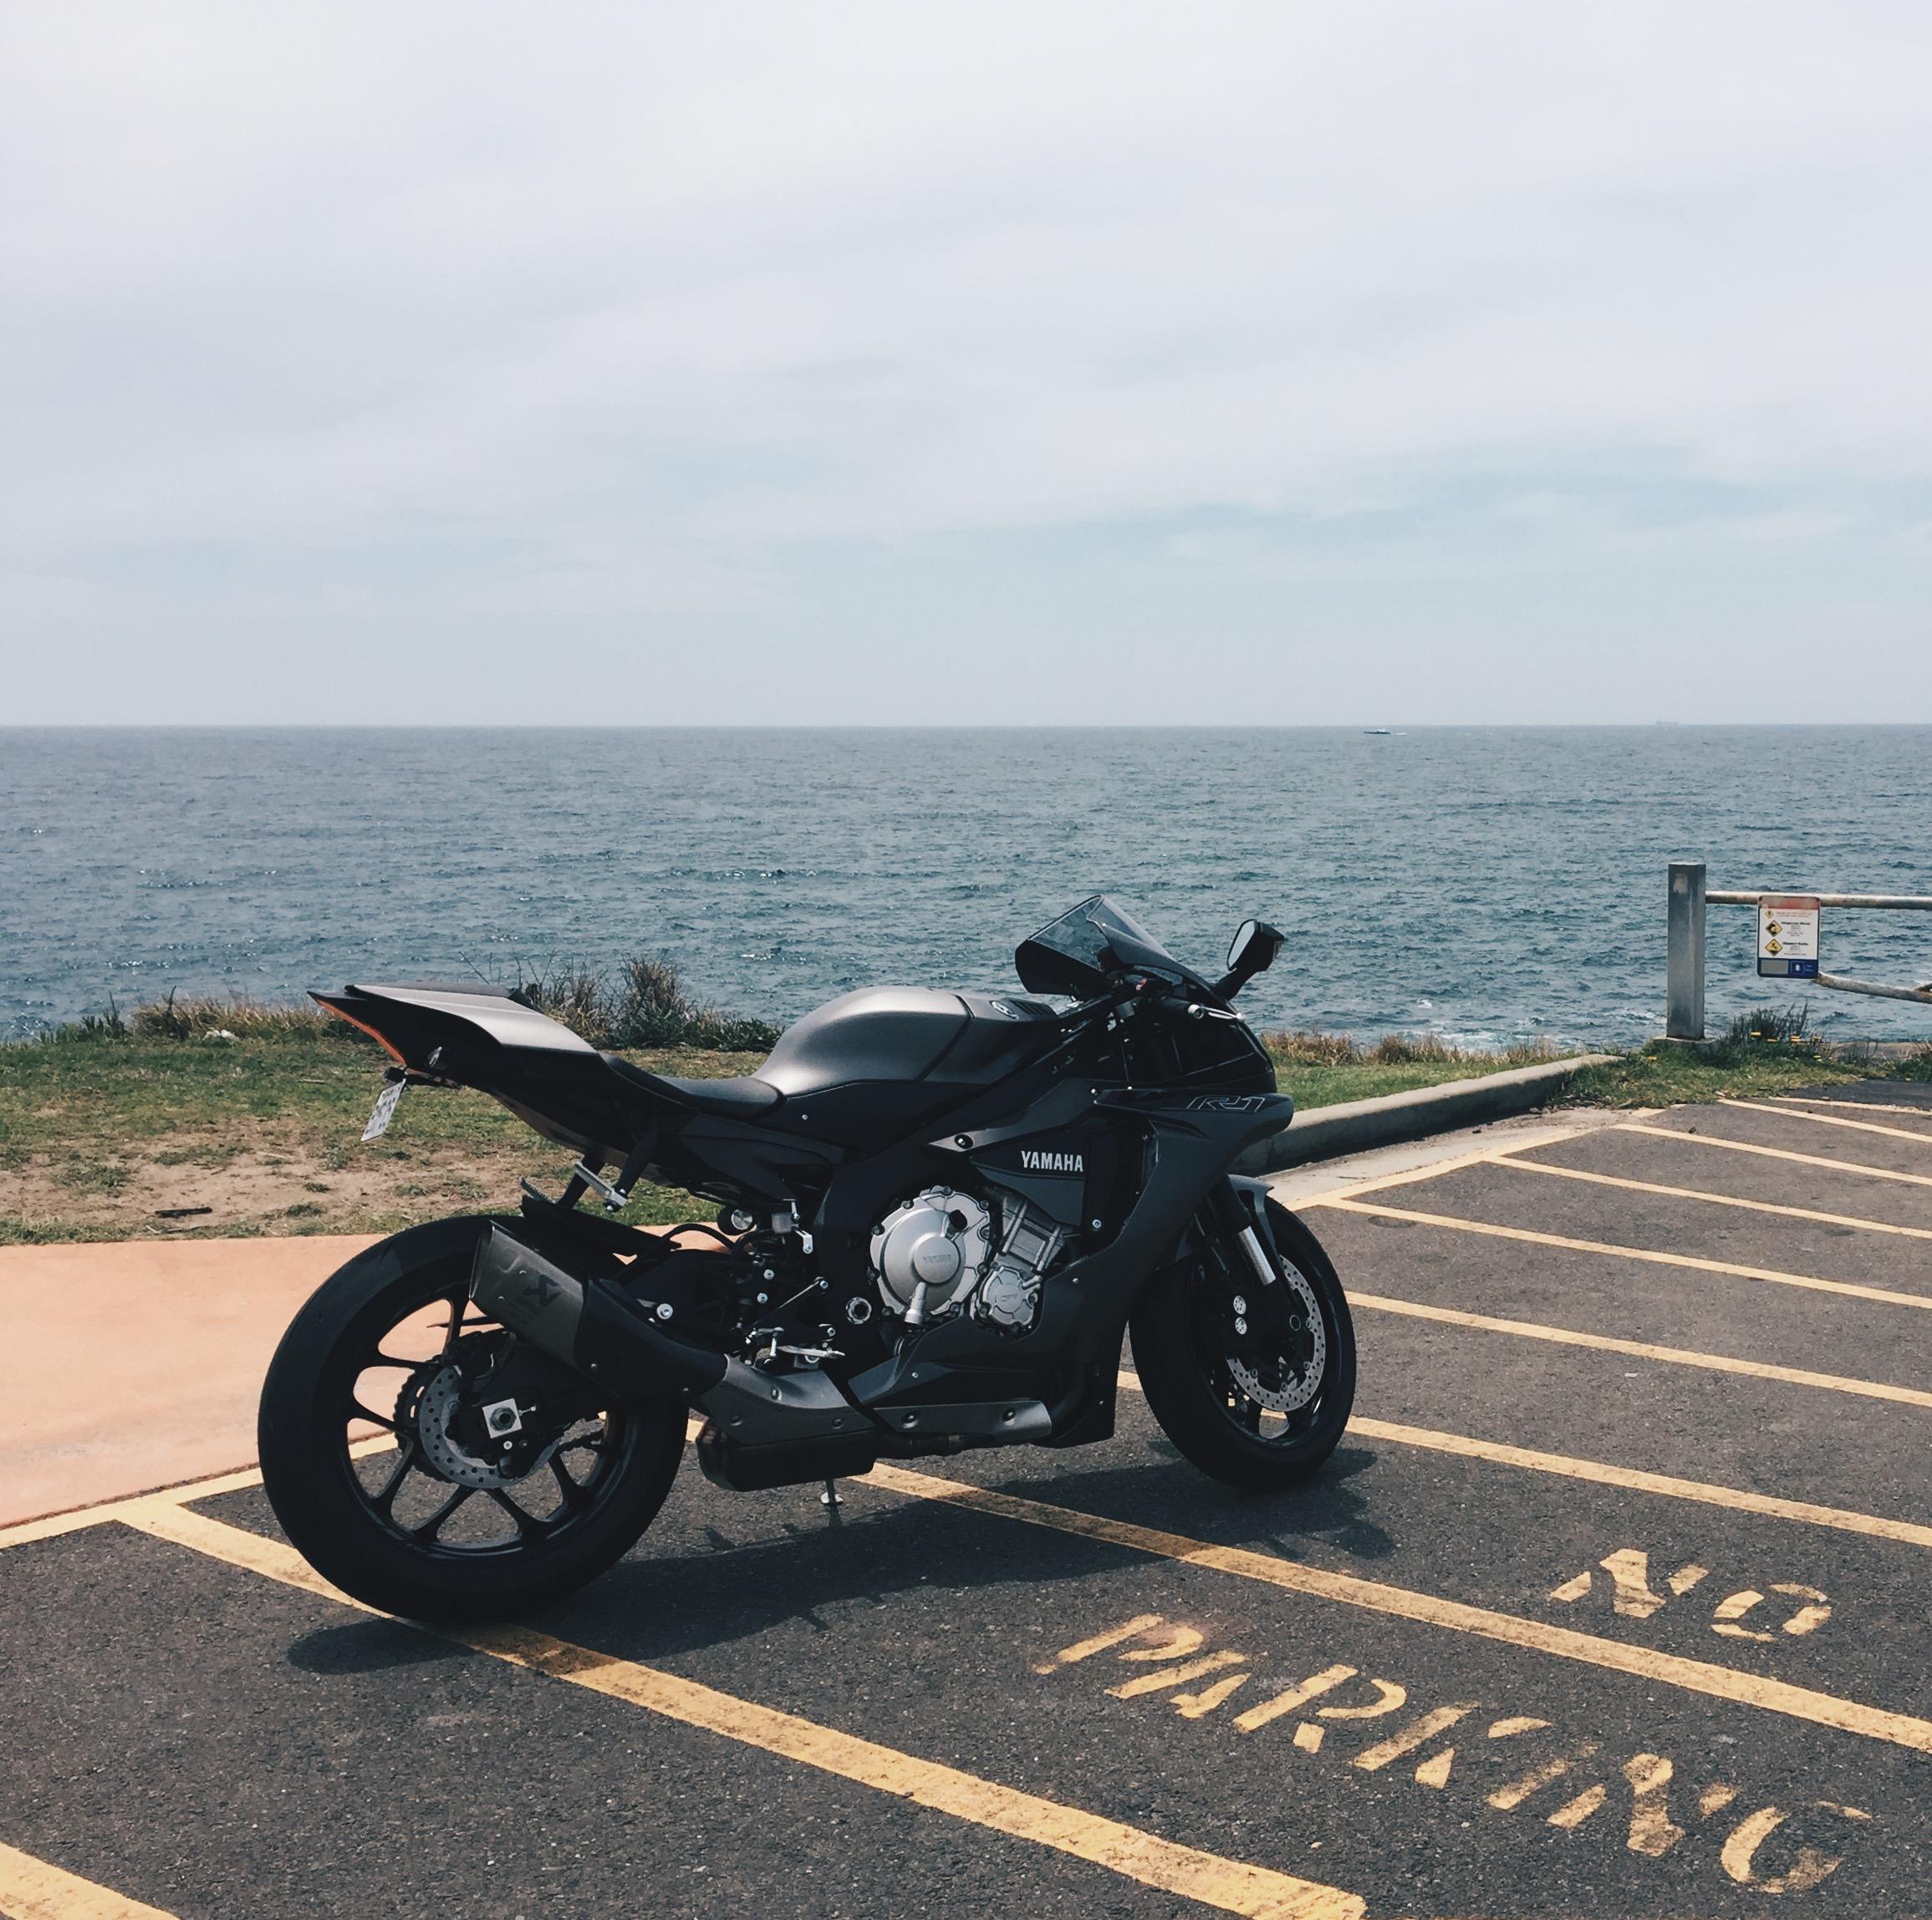 2016 Yamaha R1 2016 Yamaha R1 (grey/black)